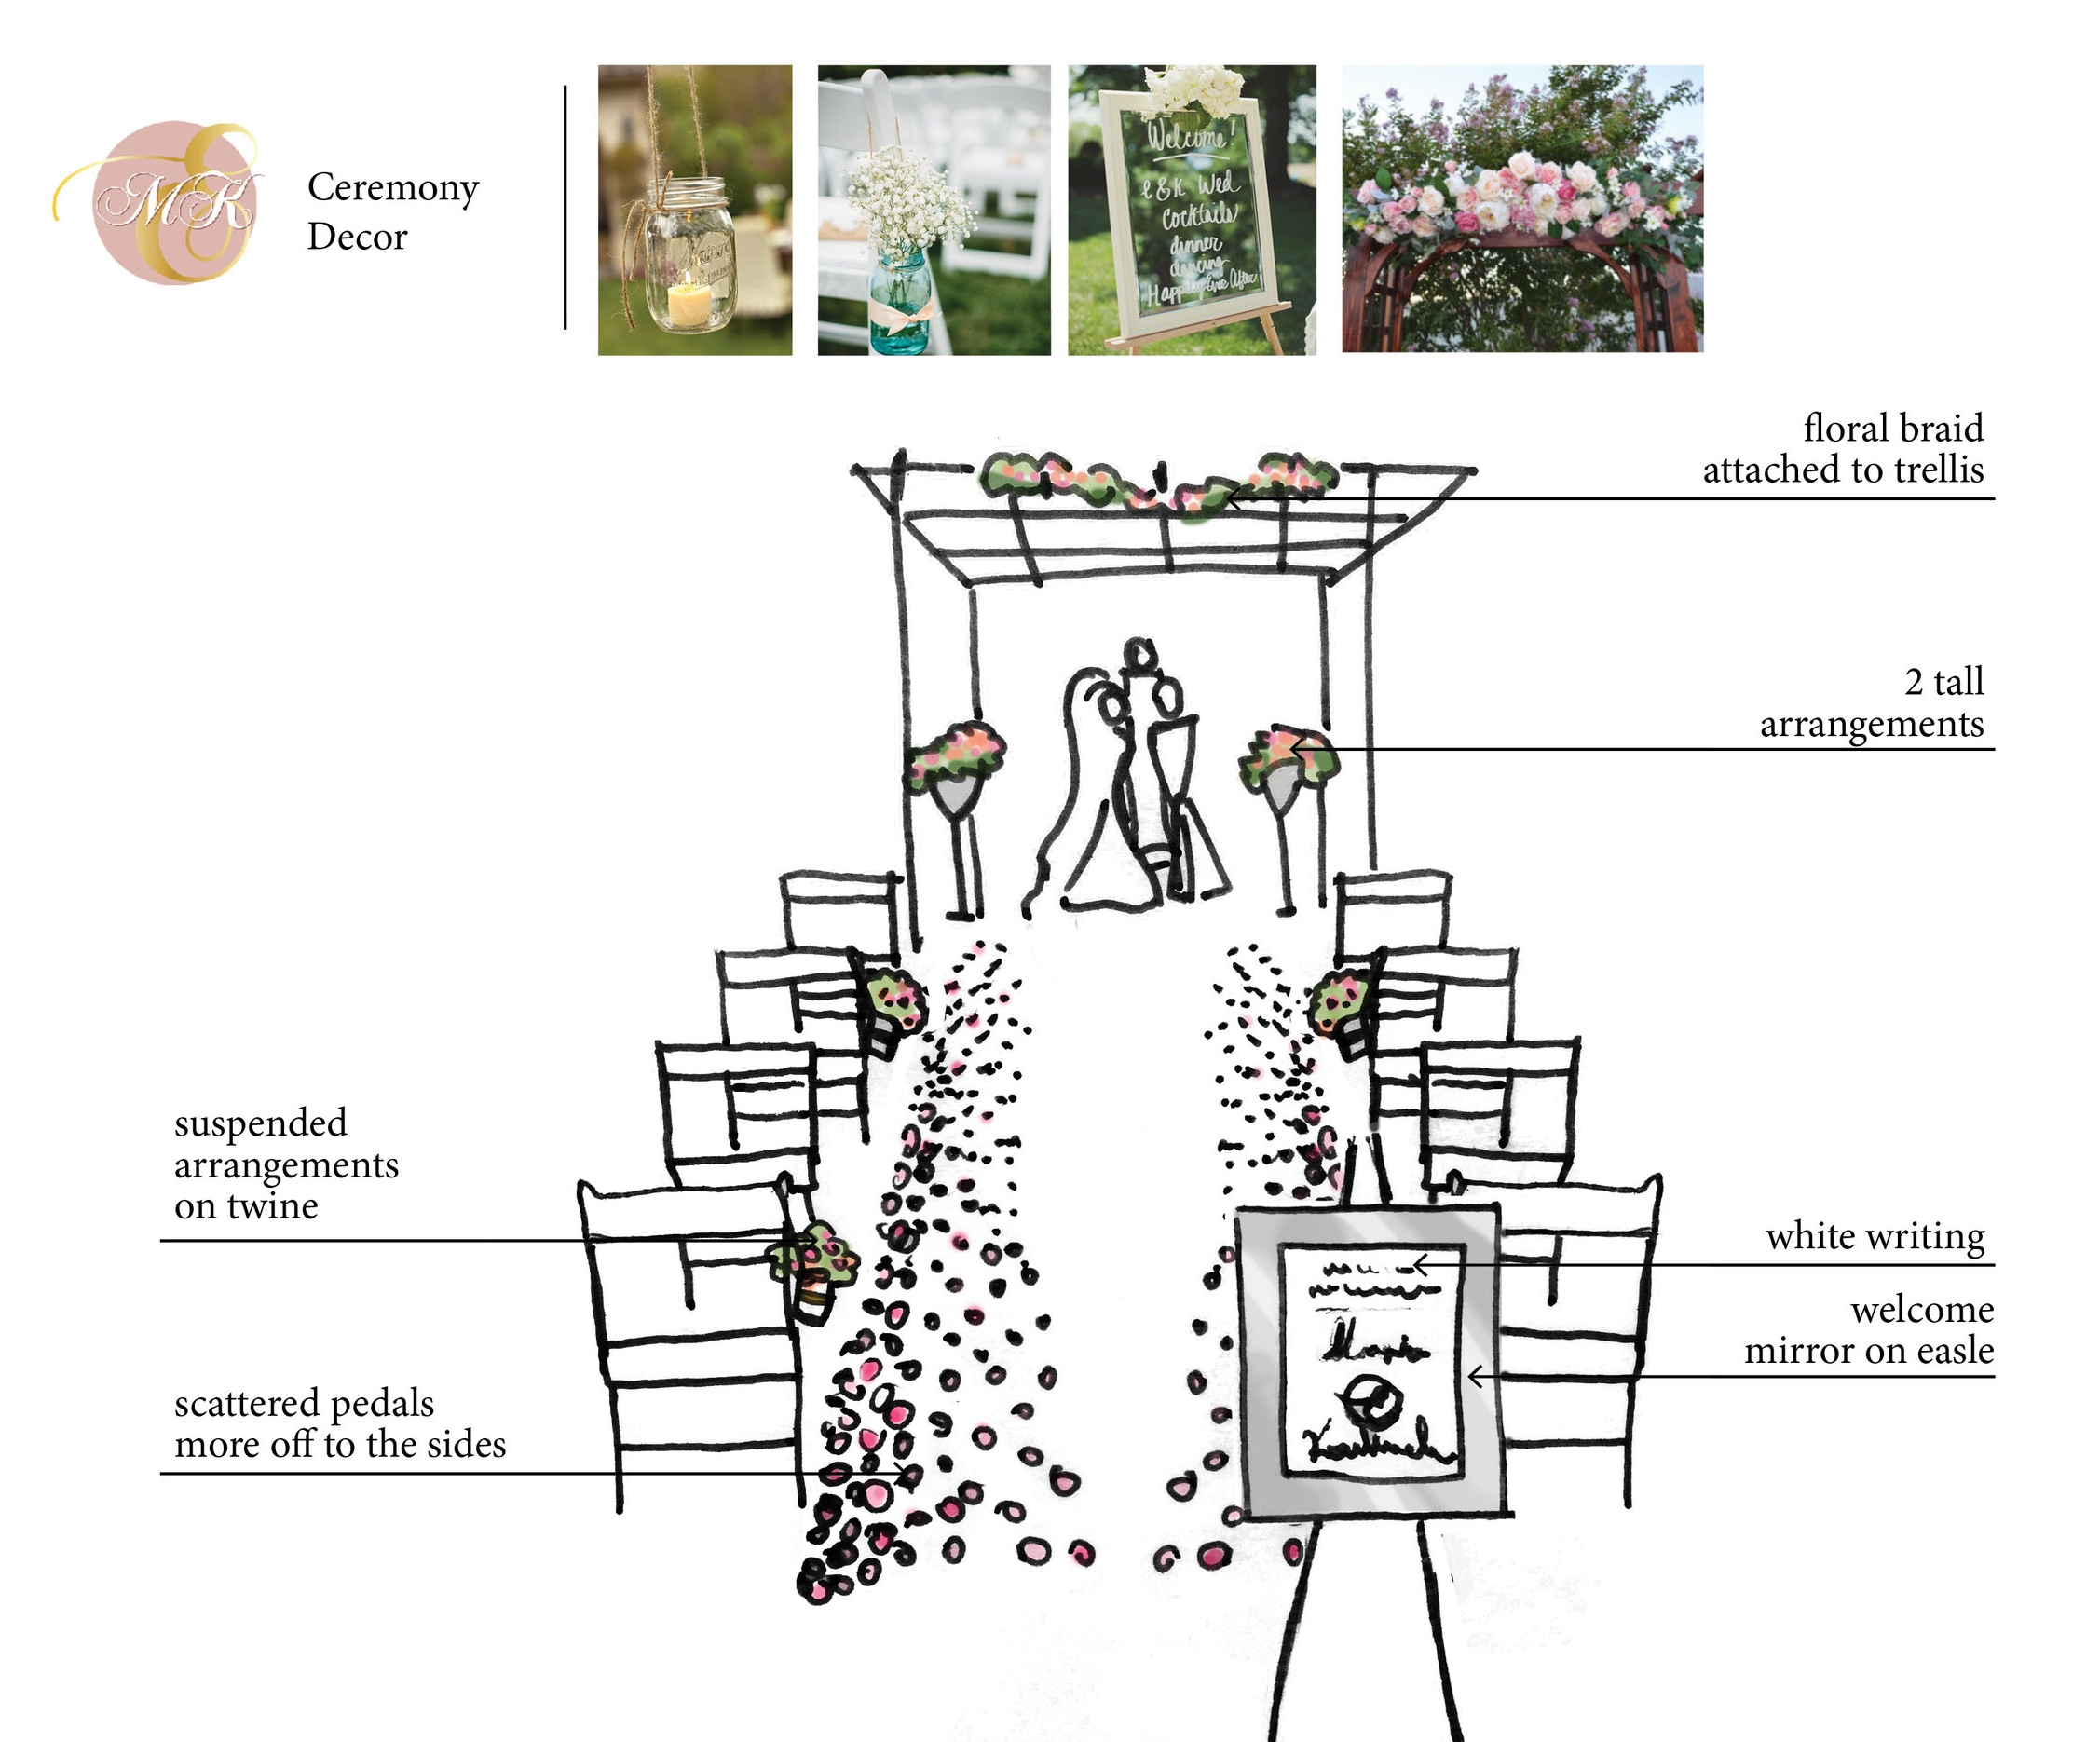 Ceremony Design & Planning